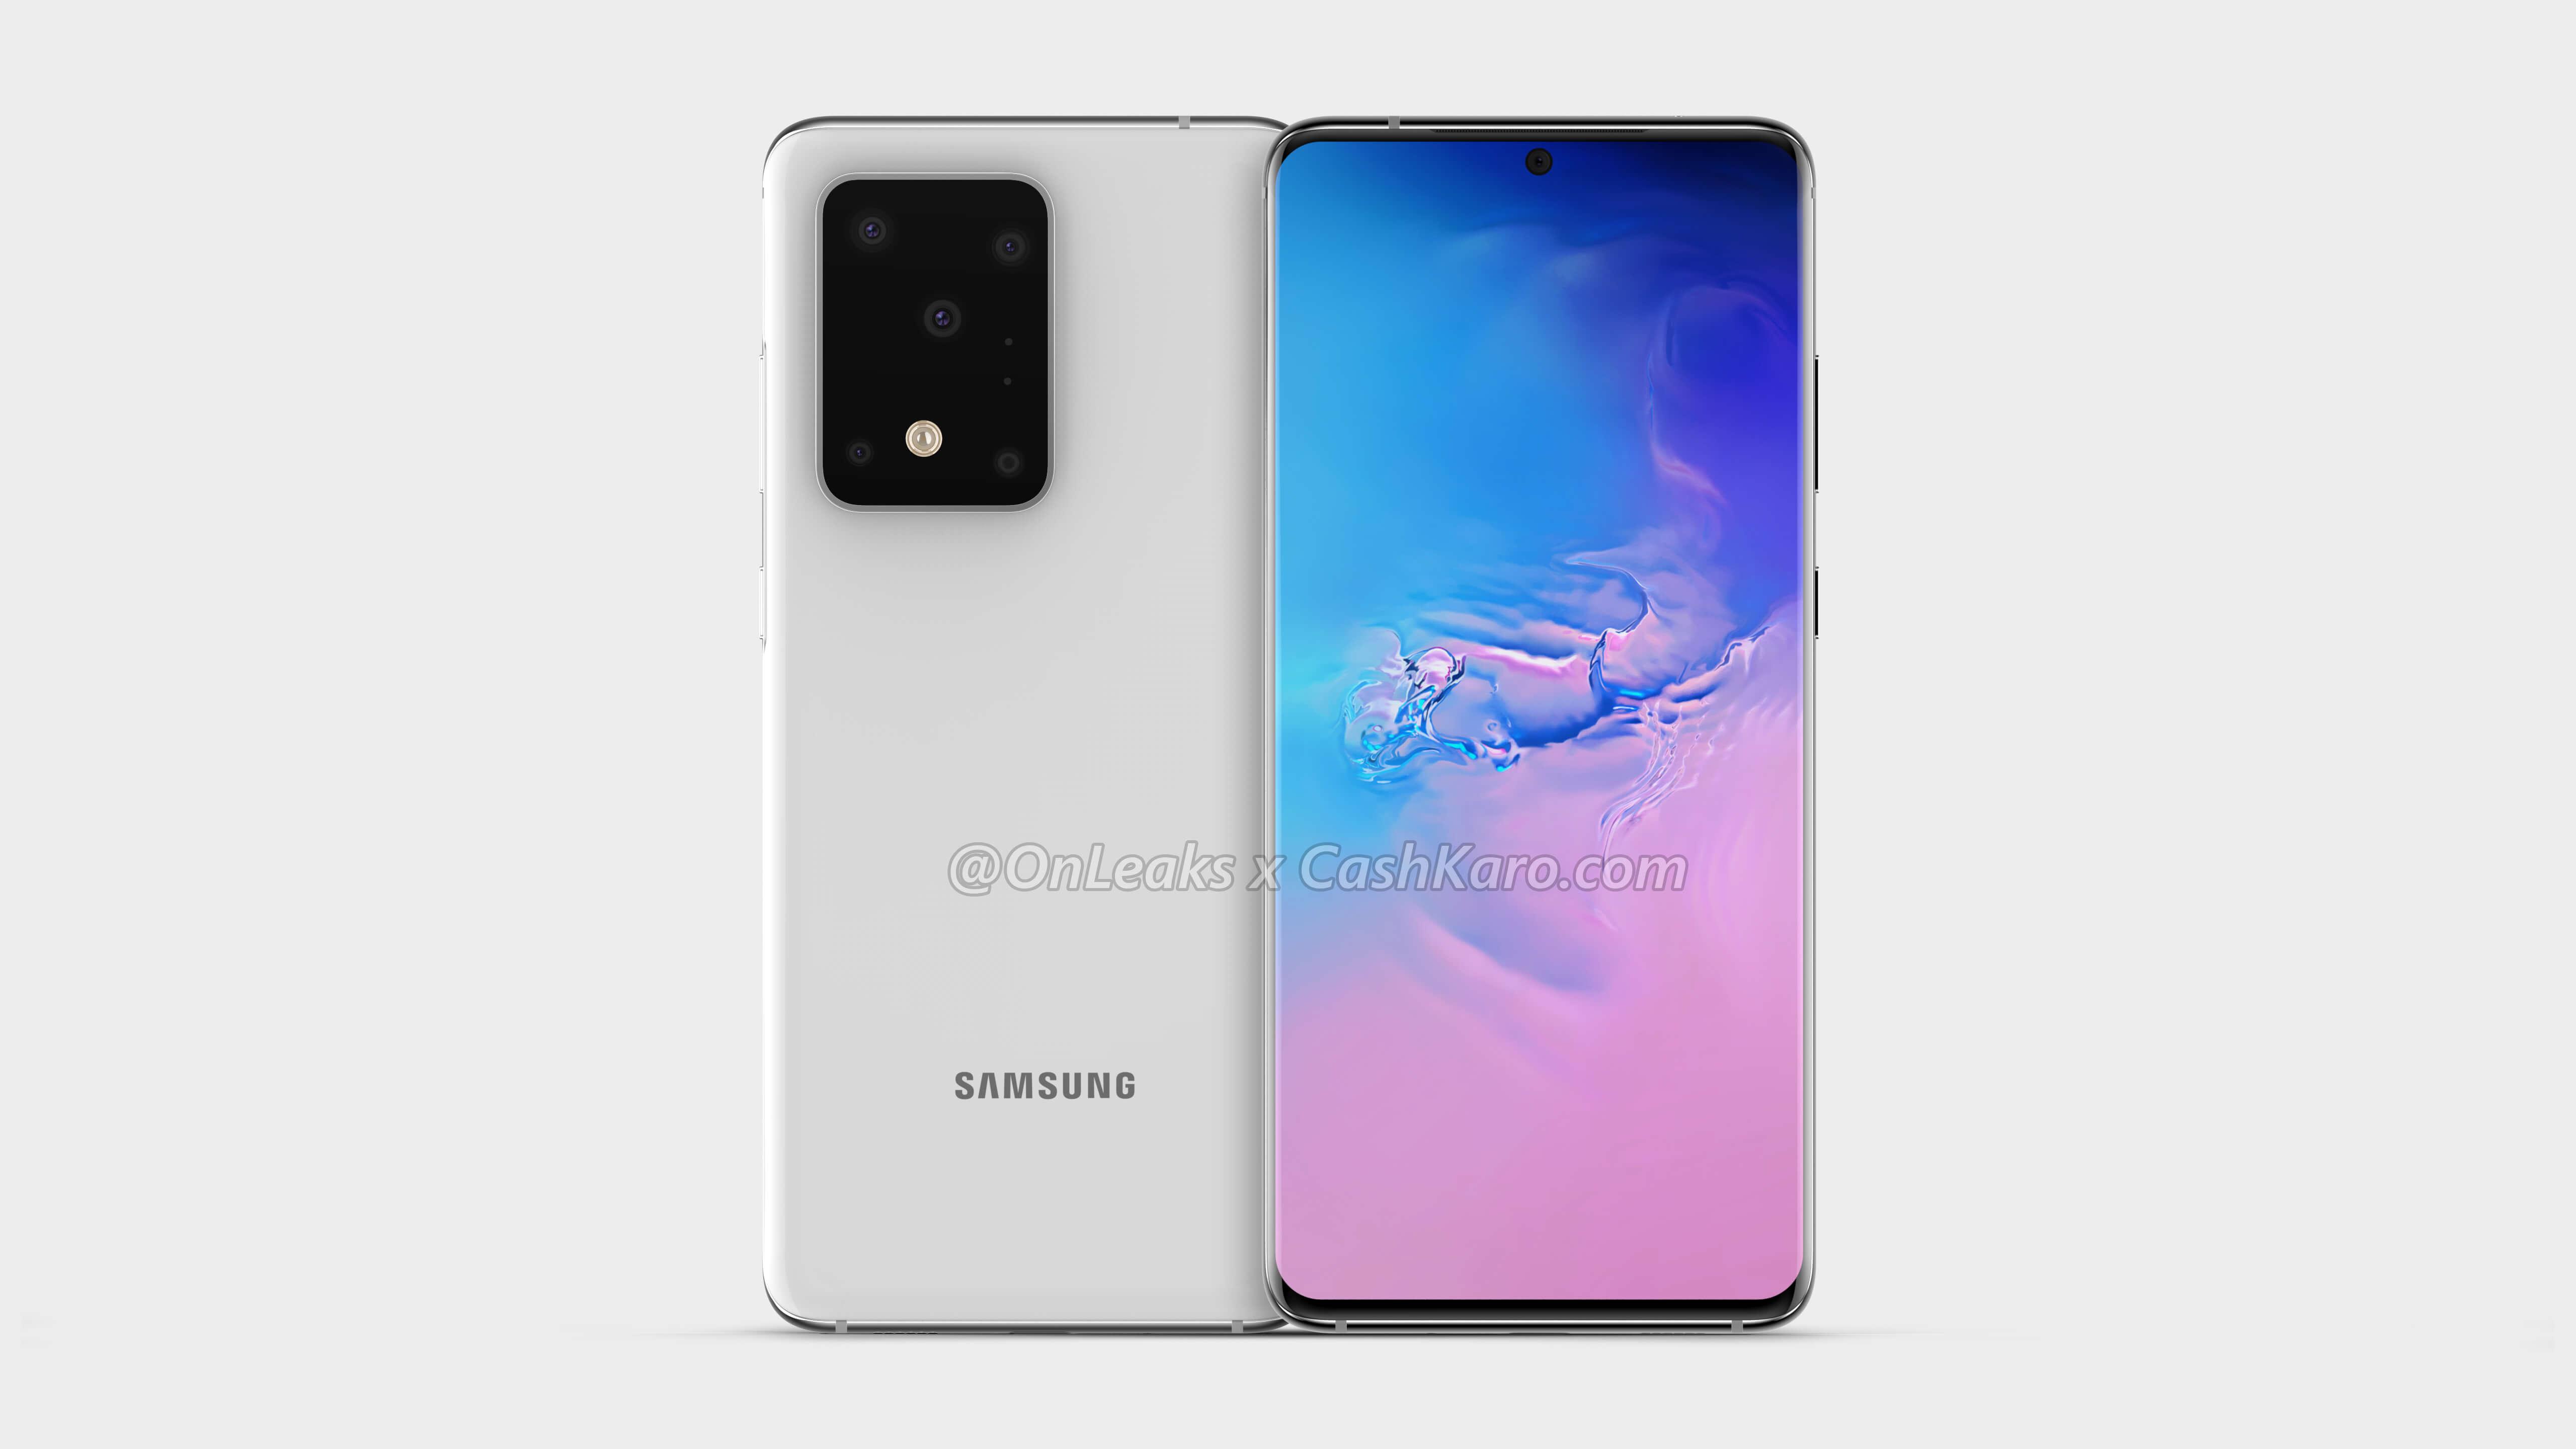 Samsung GALAXY S11 Plus camera urata iphone